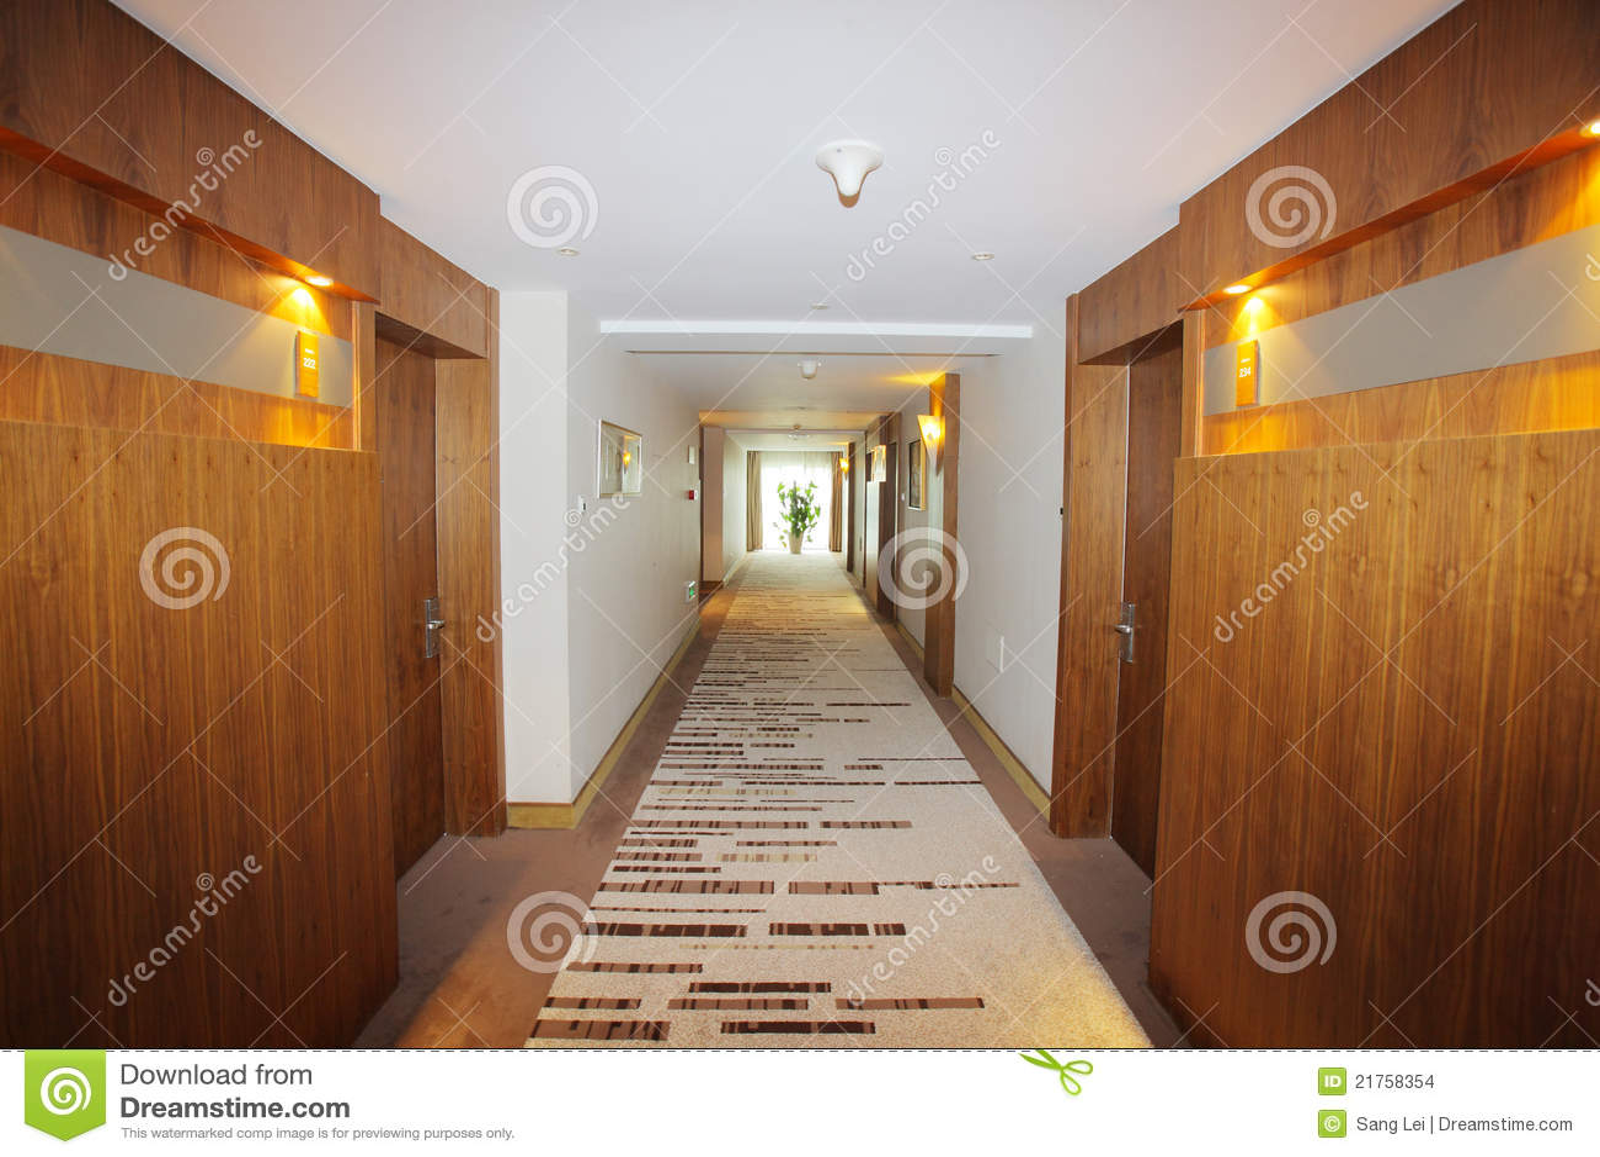 Corridor In Hotel Stock Photo Image Of Inside Interior